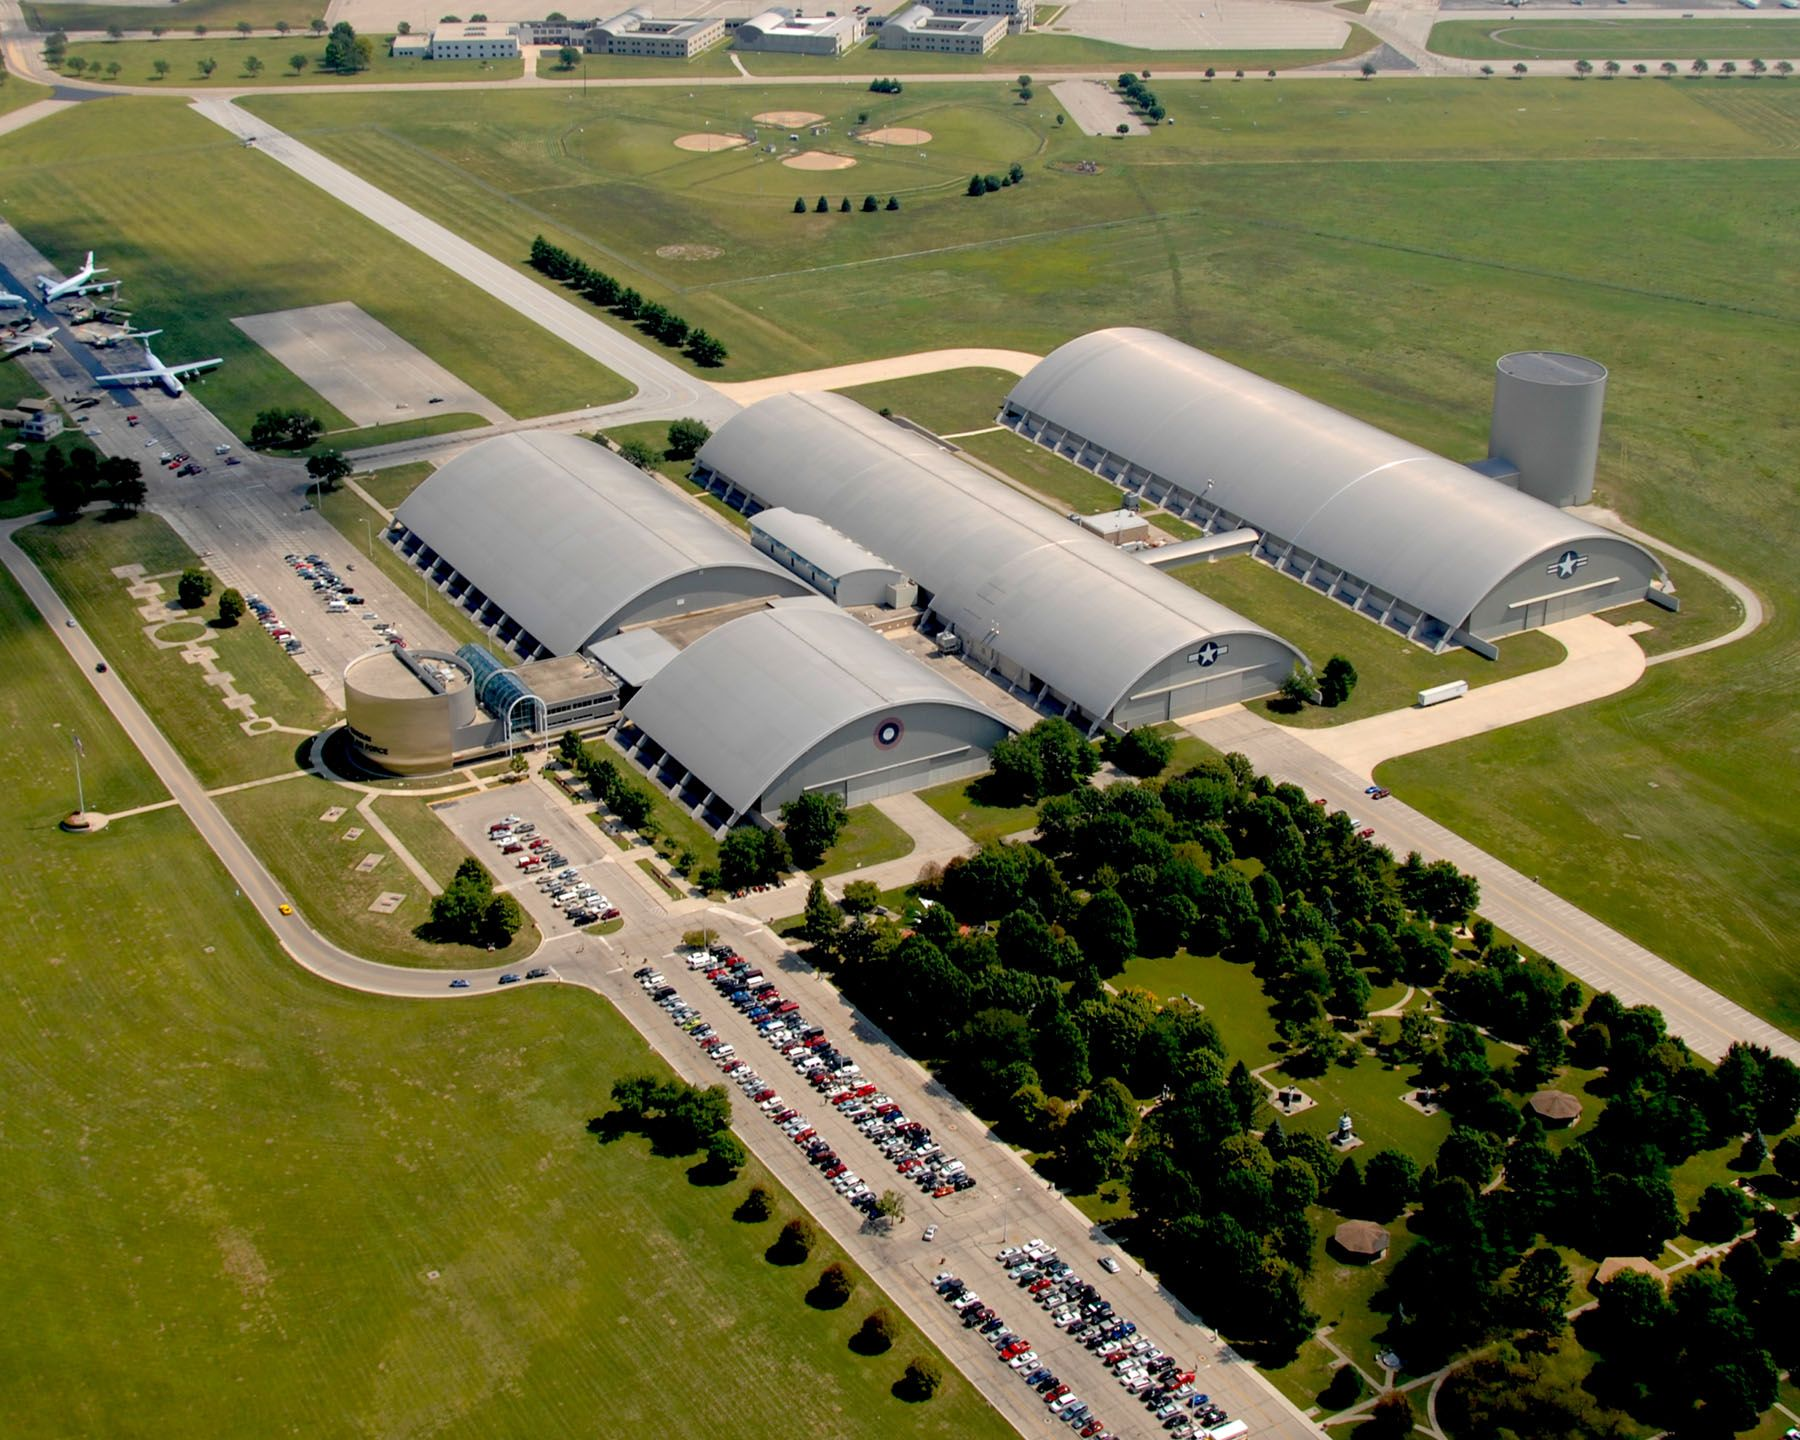 United States Air Force Museum Dayton Ohio